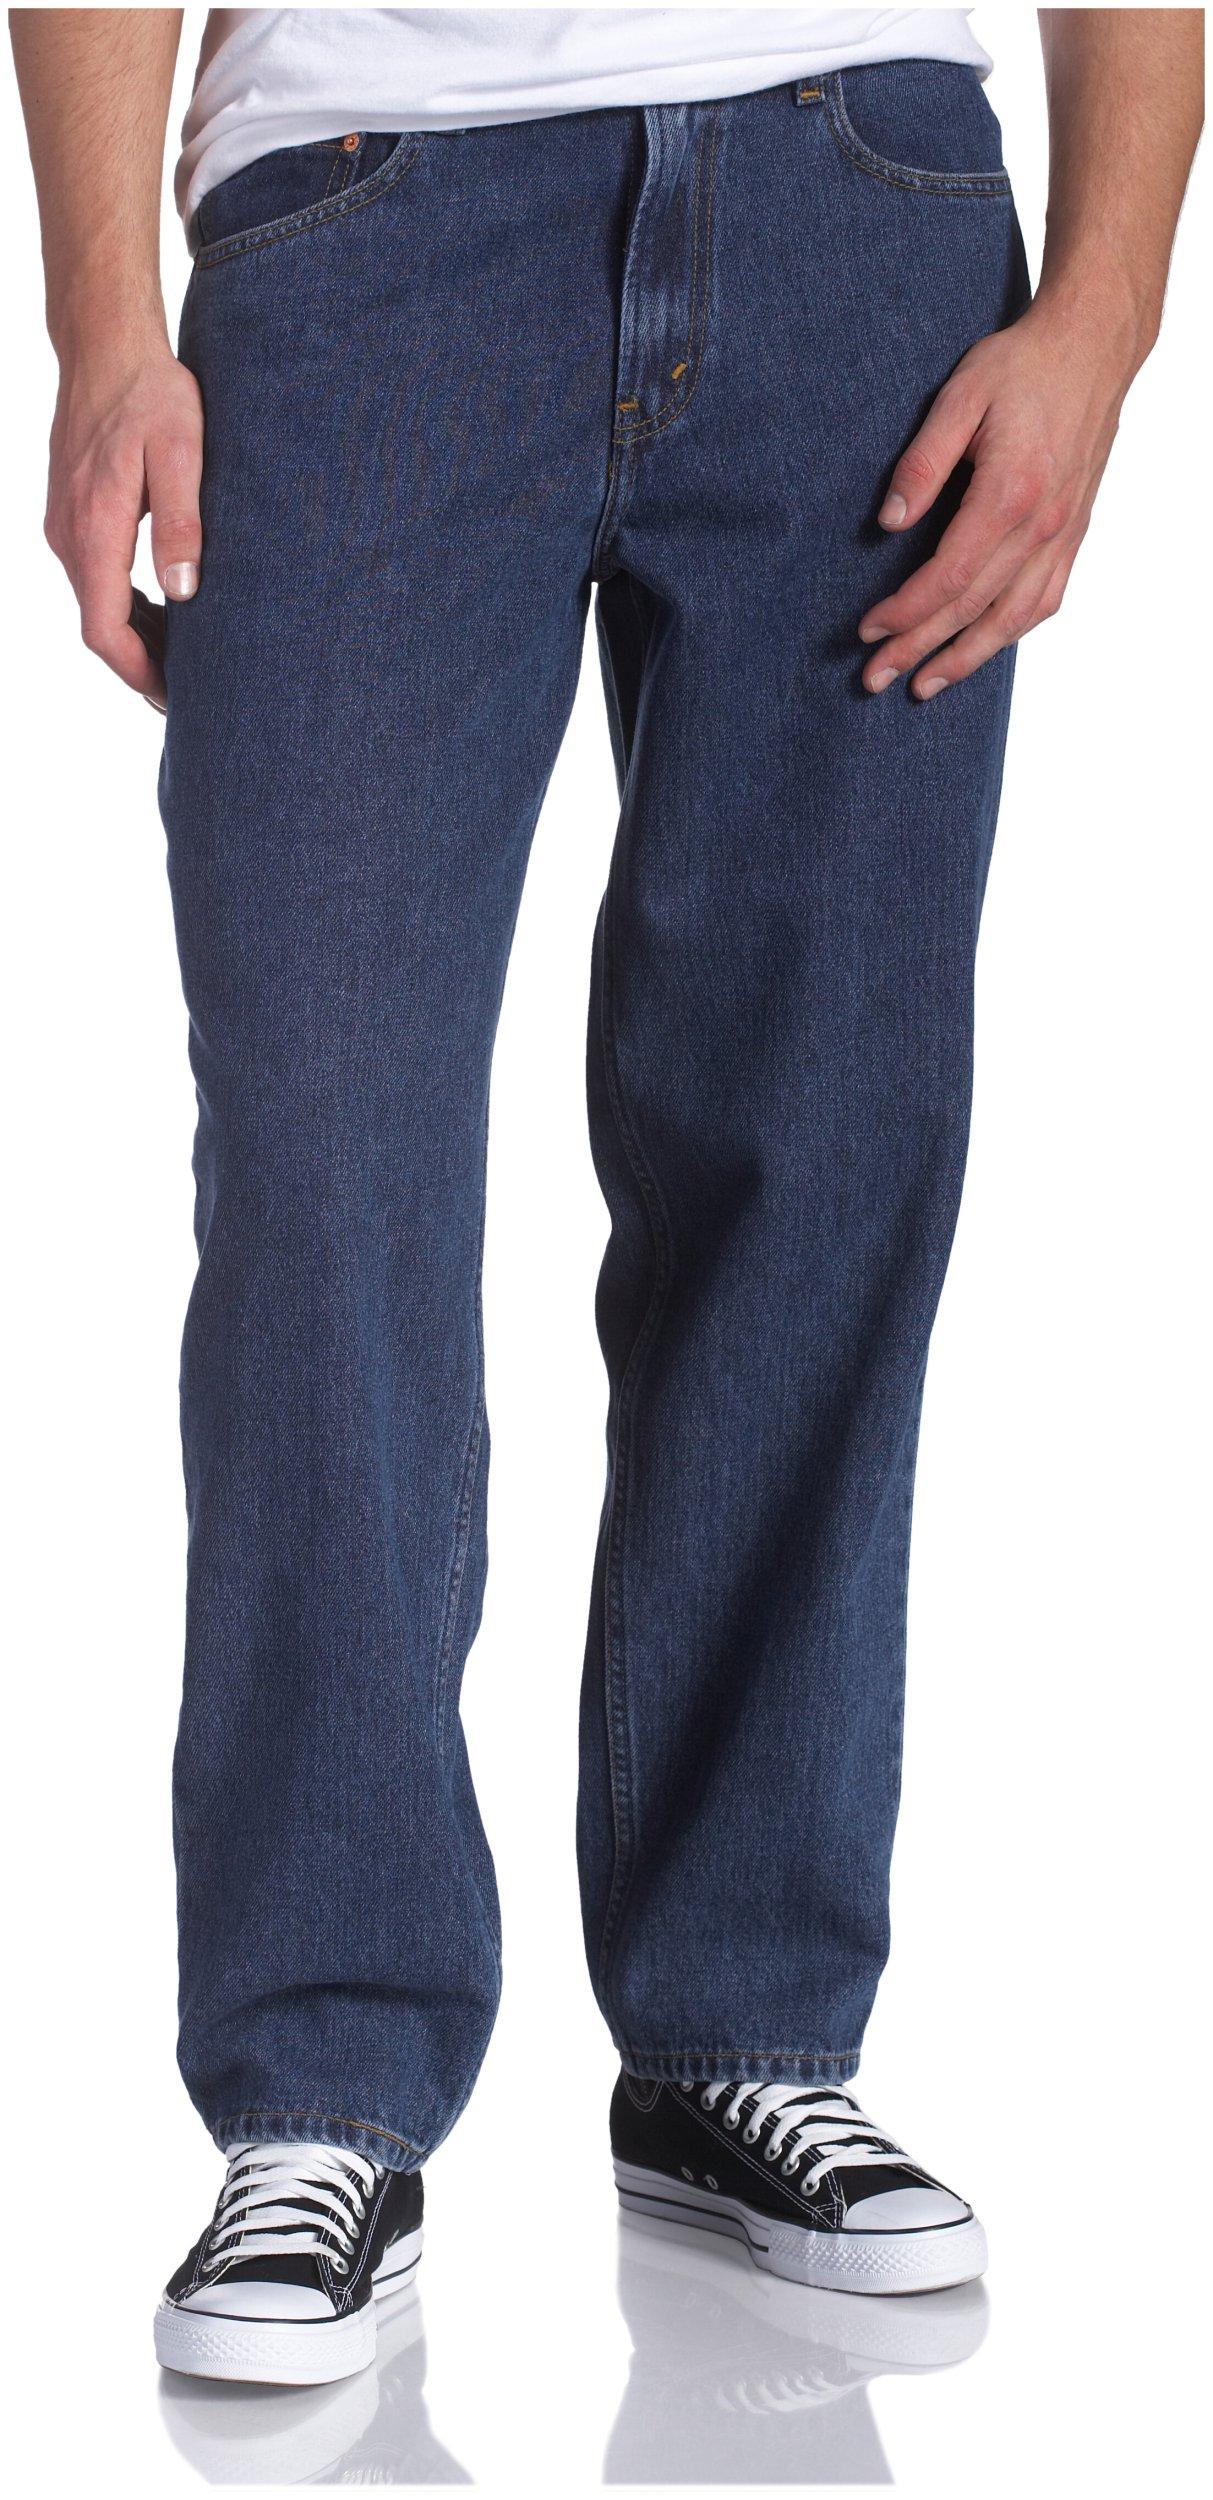 Levi's Men's 560 Comfort Fit Denim Jeans, Dark Stonewash, 46x30 by Levi's